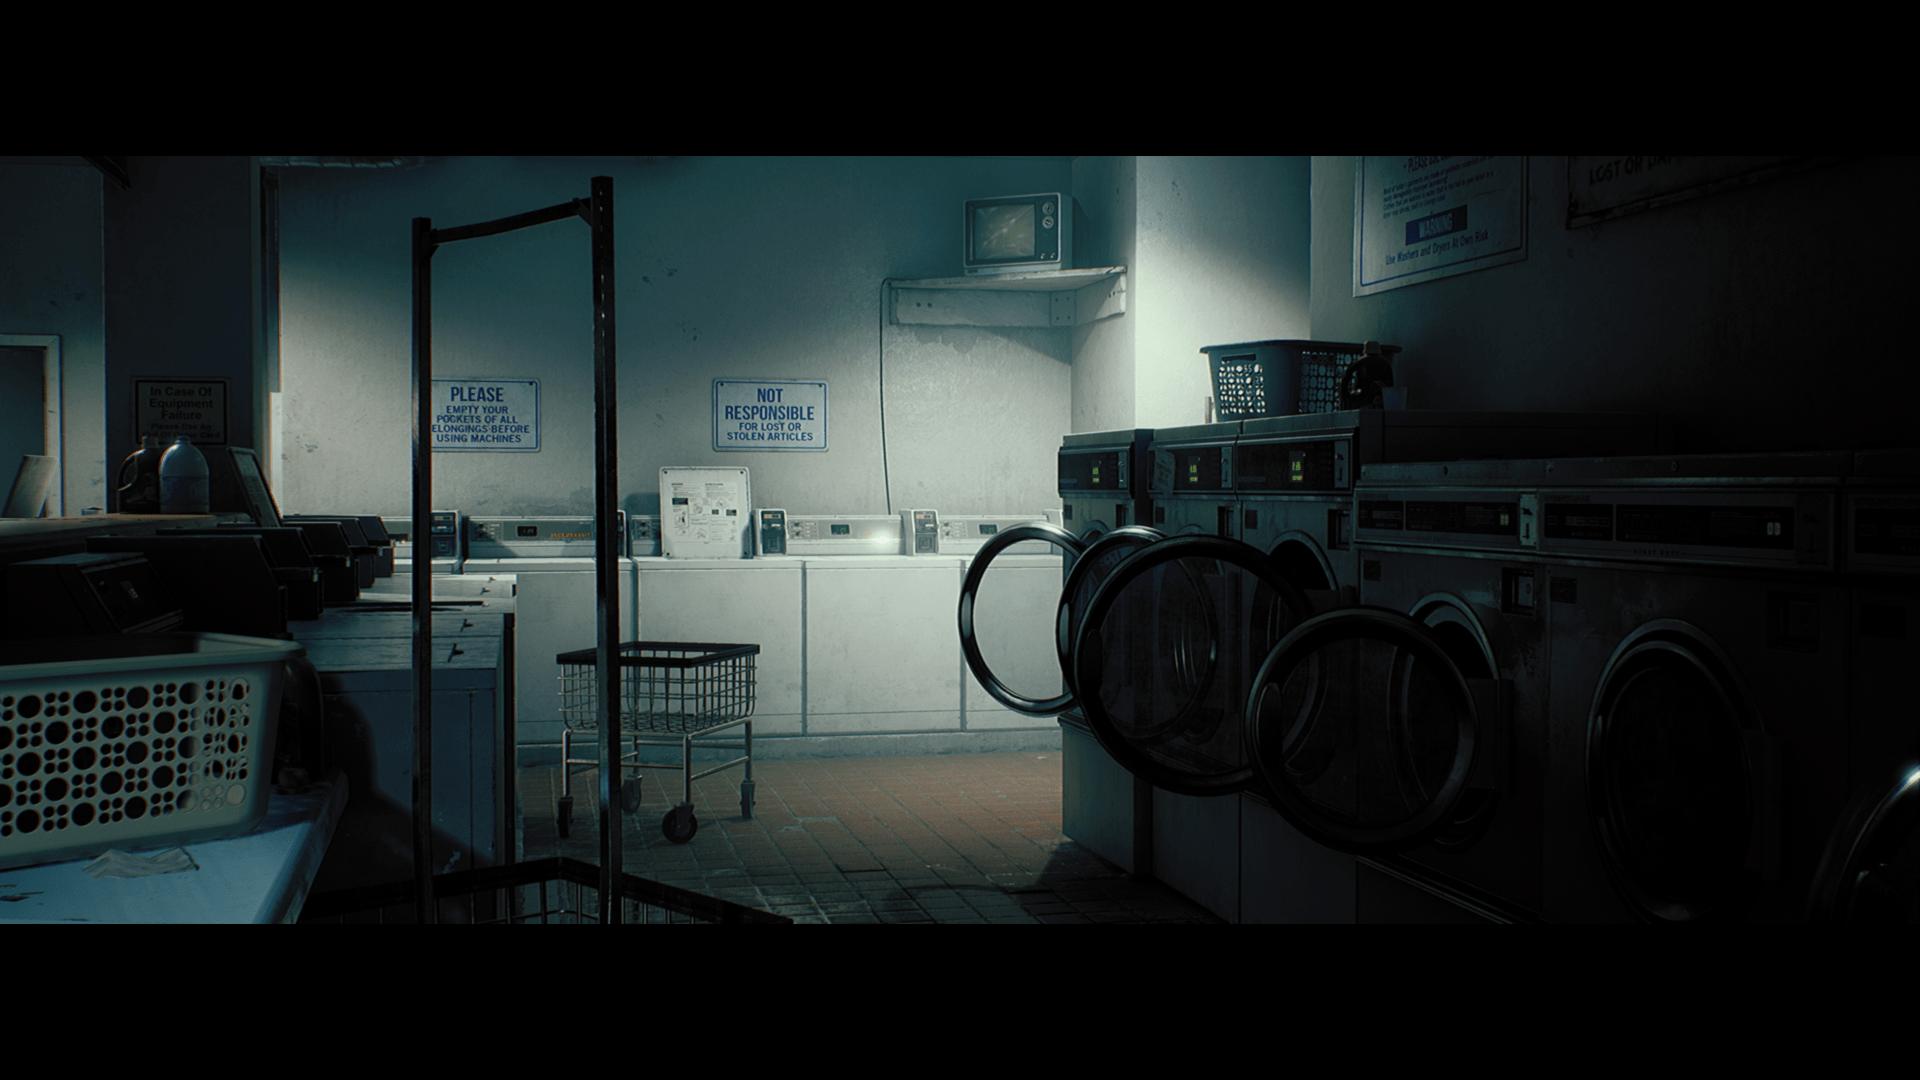 King Wash Laundromat City Scene By Dekogon Studios In